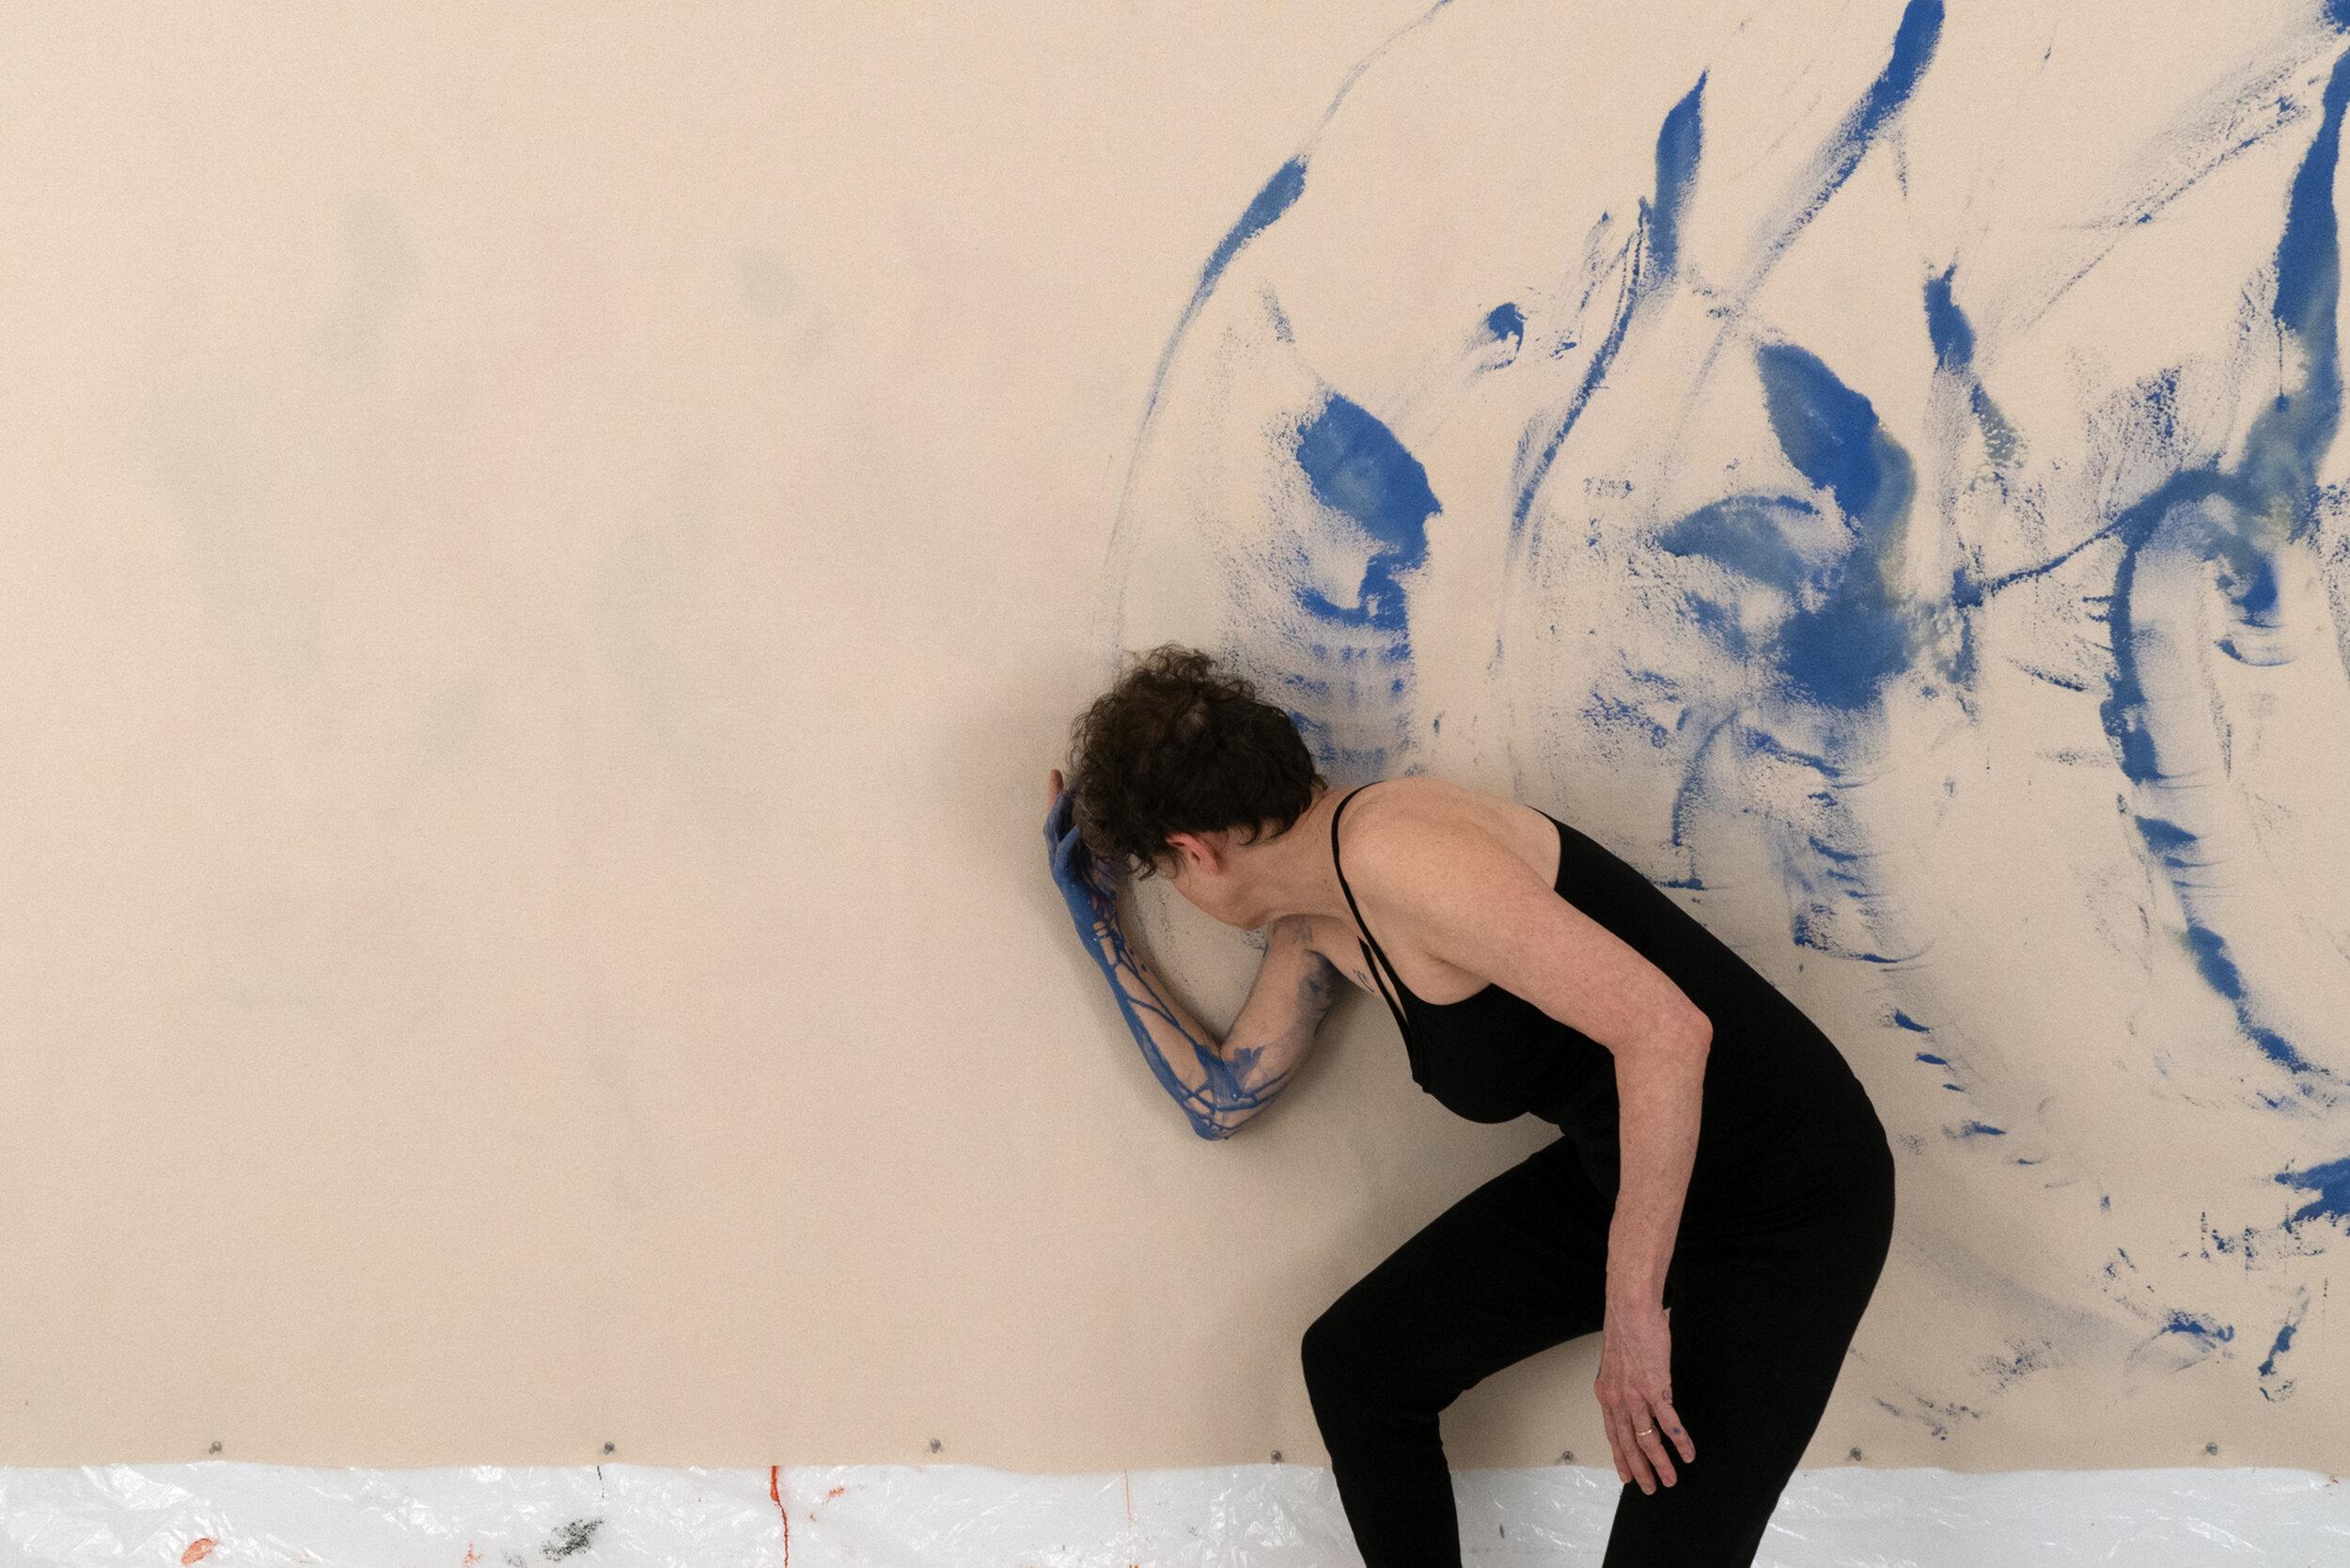 Katy_Martin_GuanYin_(Painting_Performed)_3.jpg